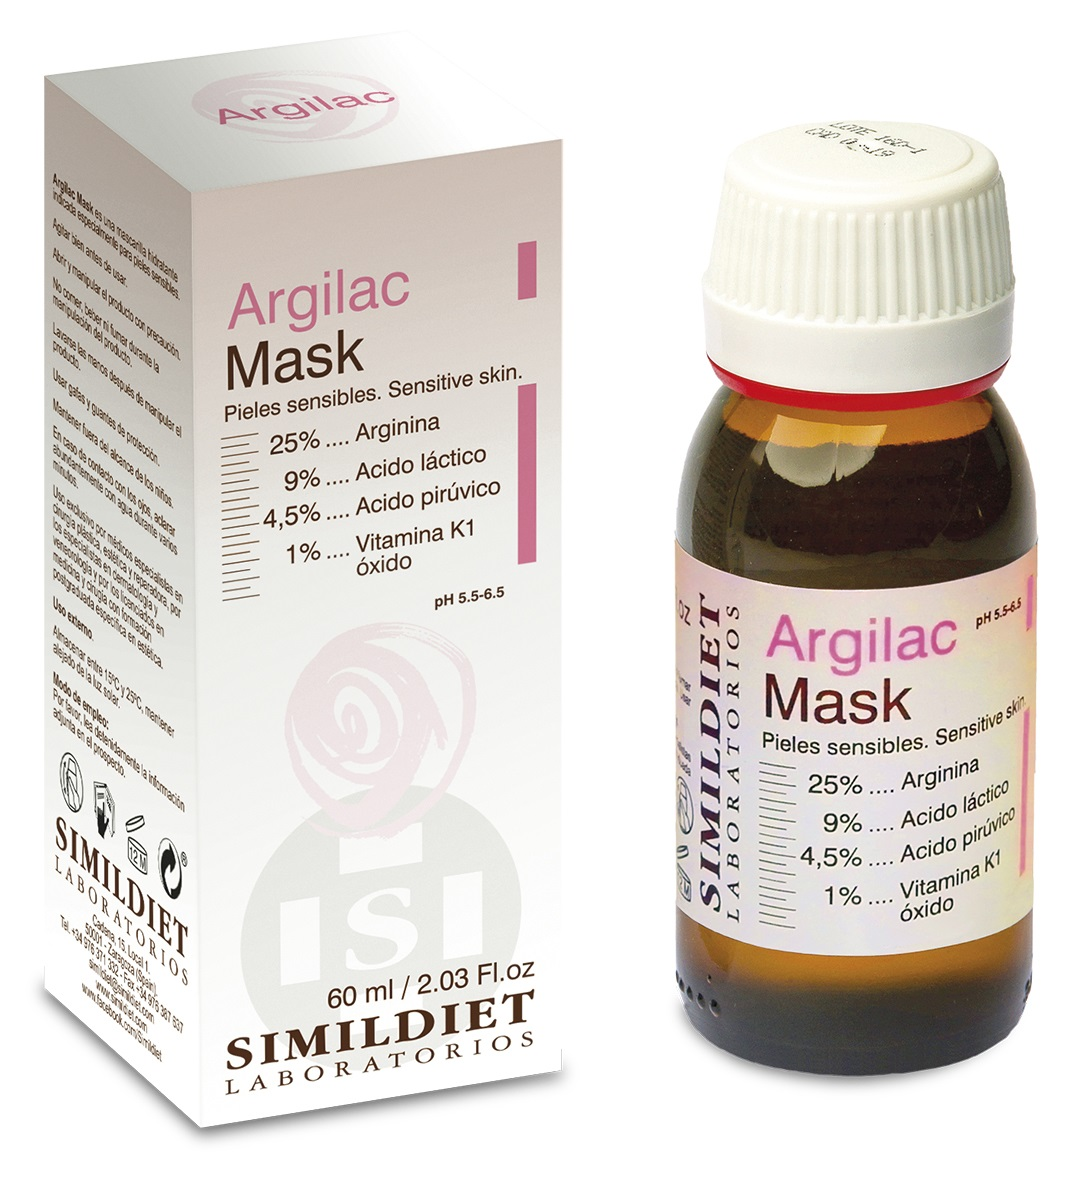 Bioceris - Argilac Mask